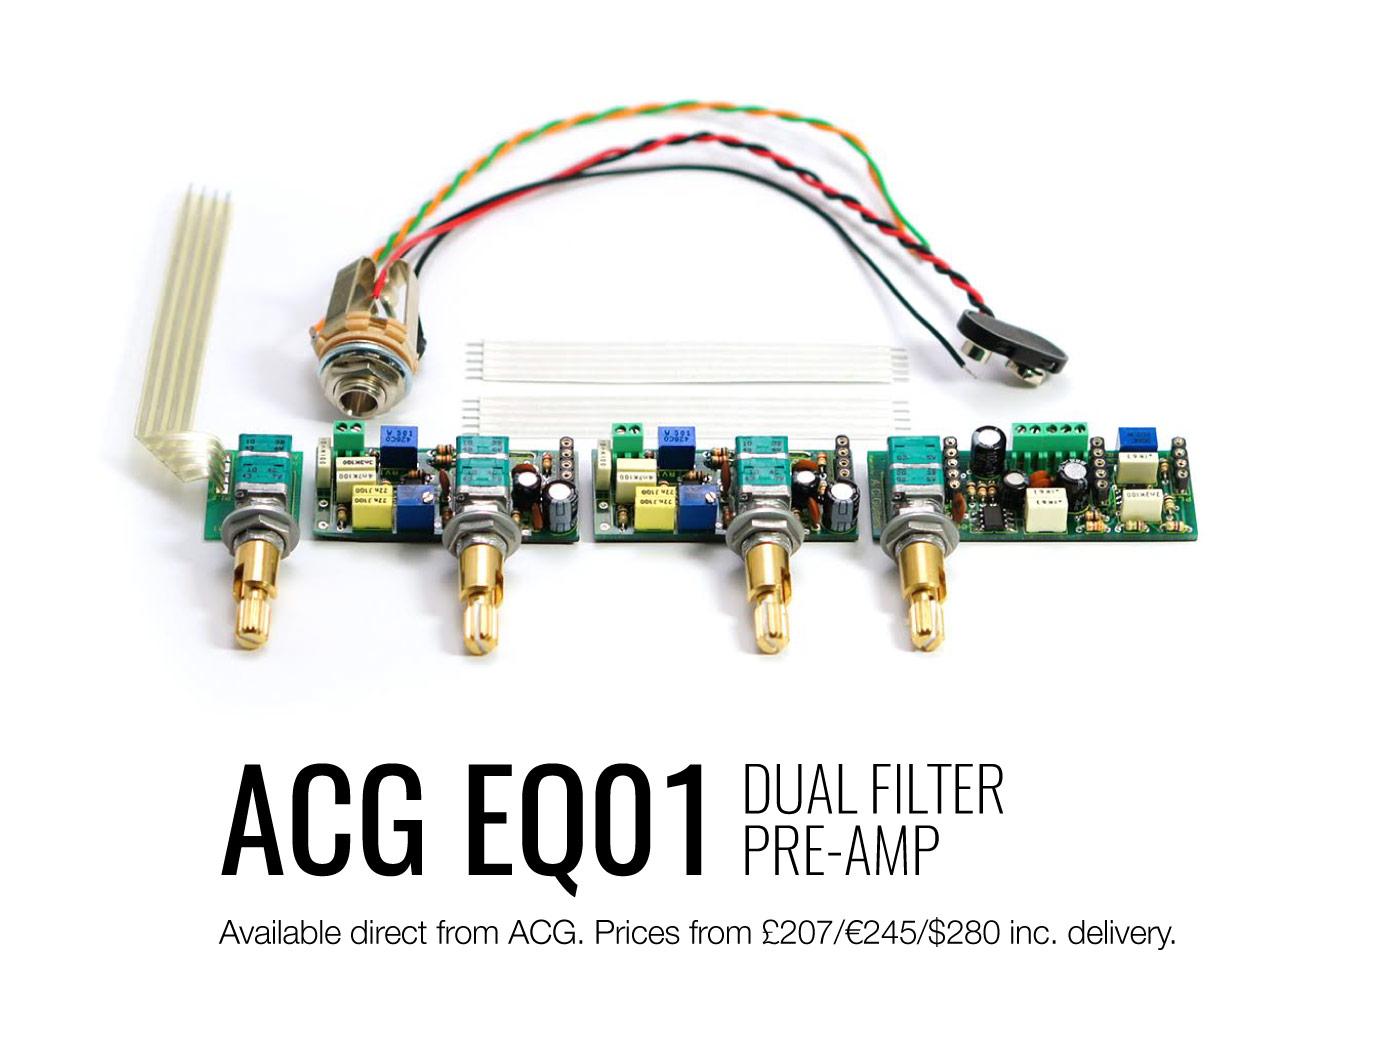 ACG_EQ01_1400x1050